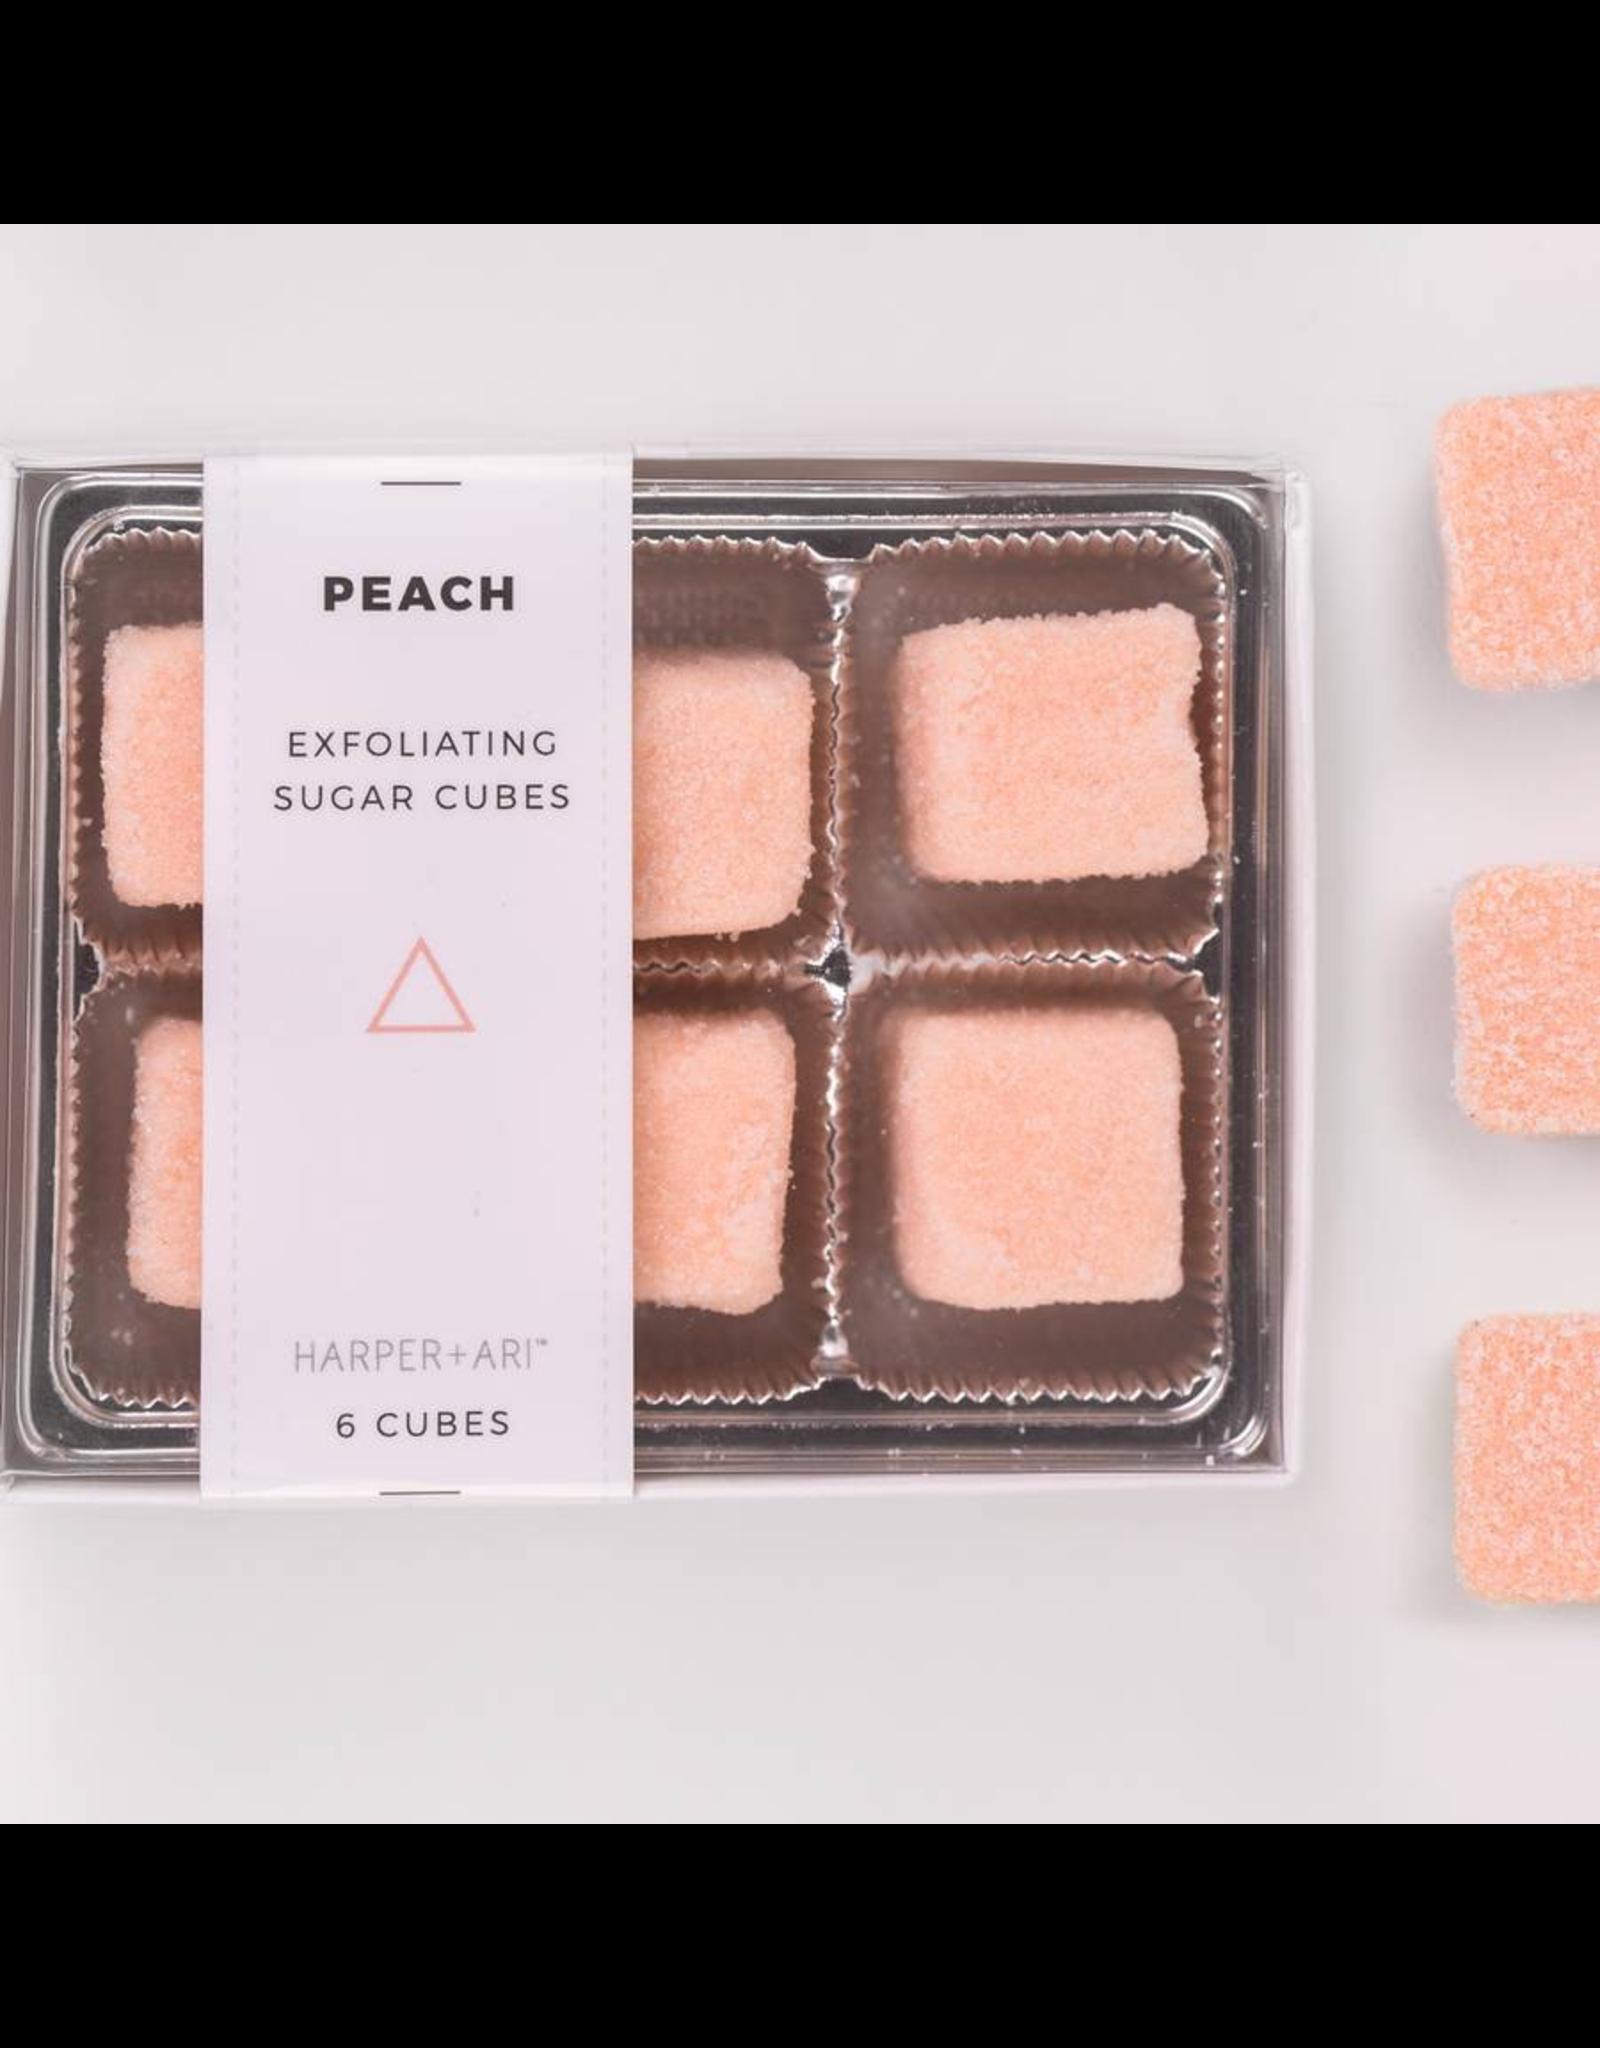 Harper + Ari Exfoliating Sugar Cubes - Peach Gift Box